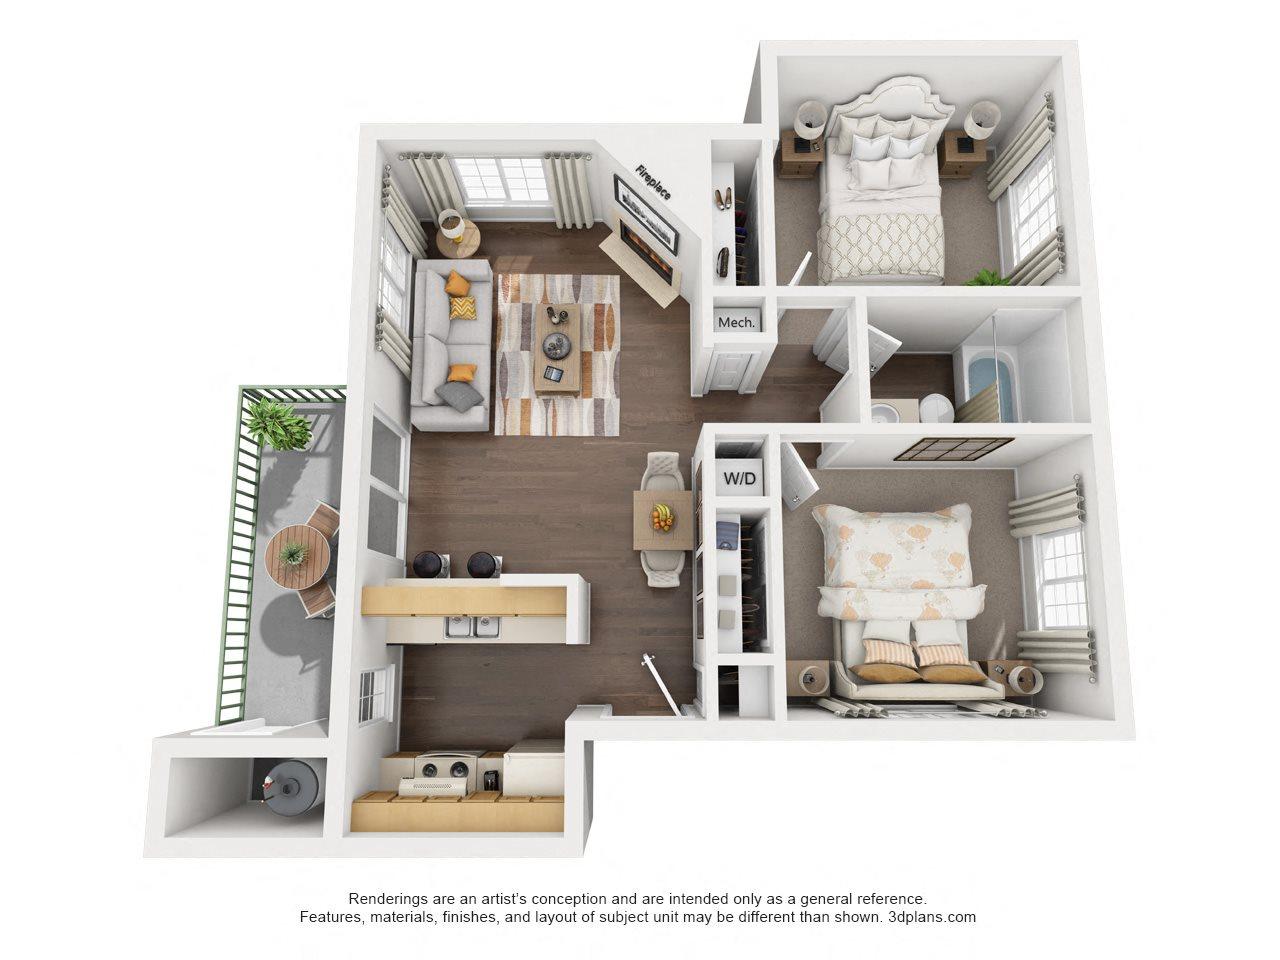 2 Bedroom, 1 Bath, Upstairs Floor Plan 4